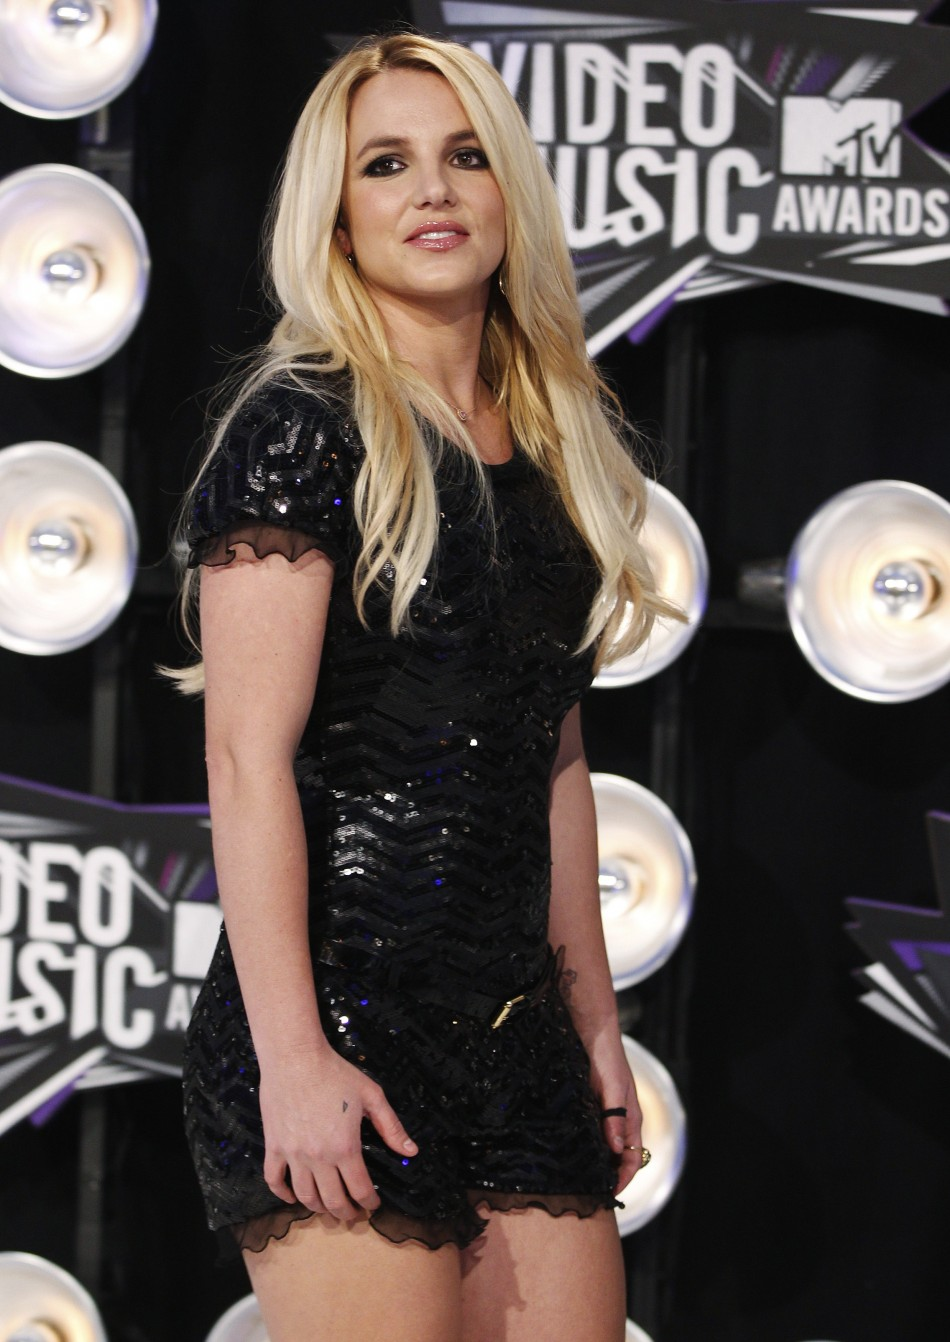 MTV Video Music Awards 2011 Top 10 Red Carpet Fashion